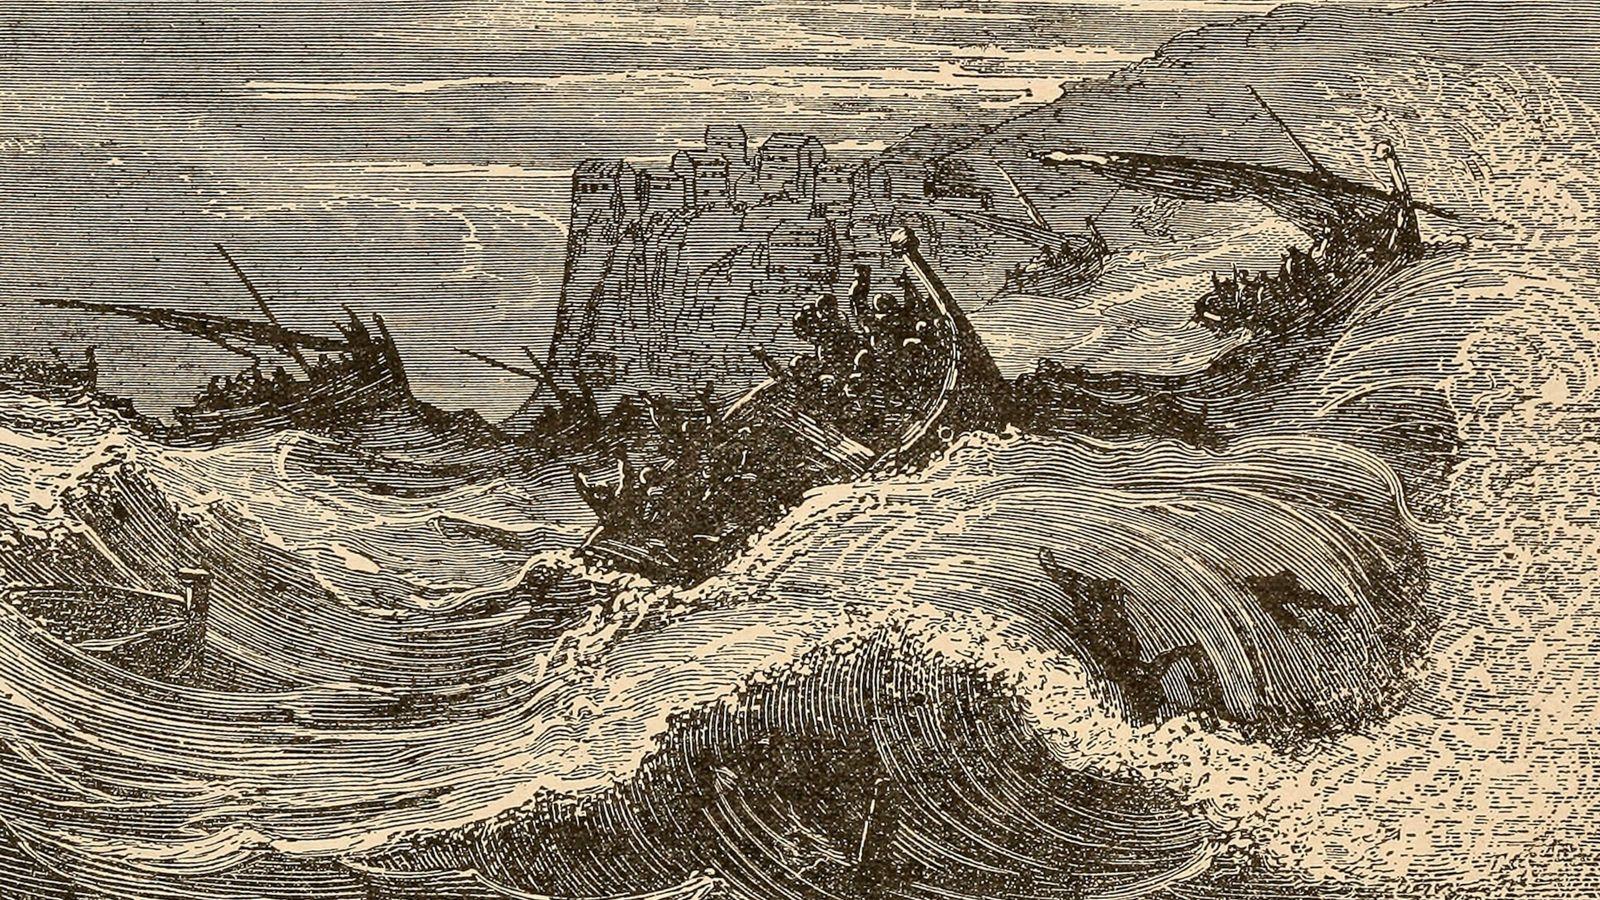 Earthquake 1861